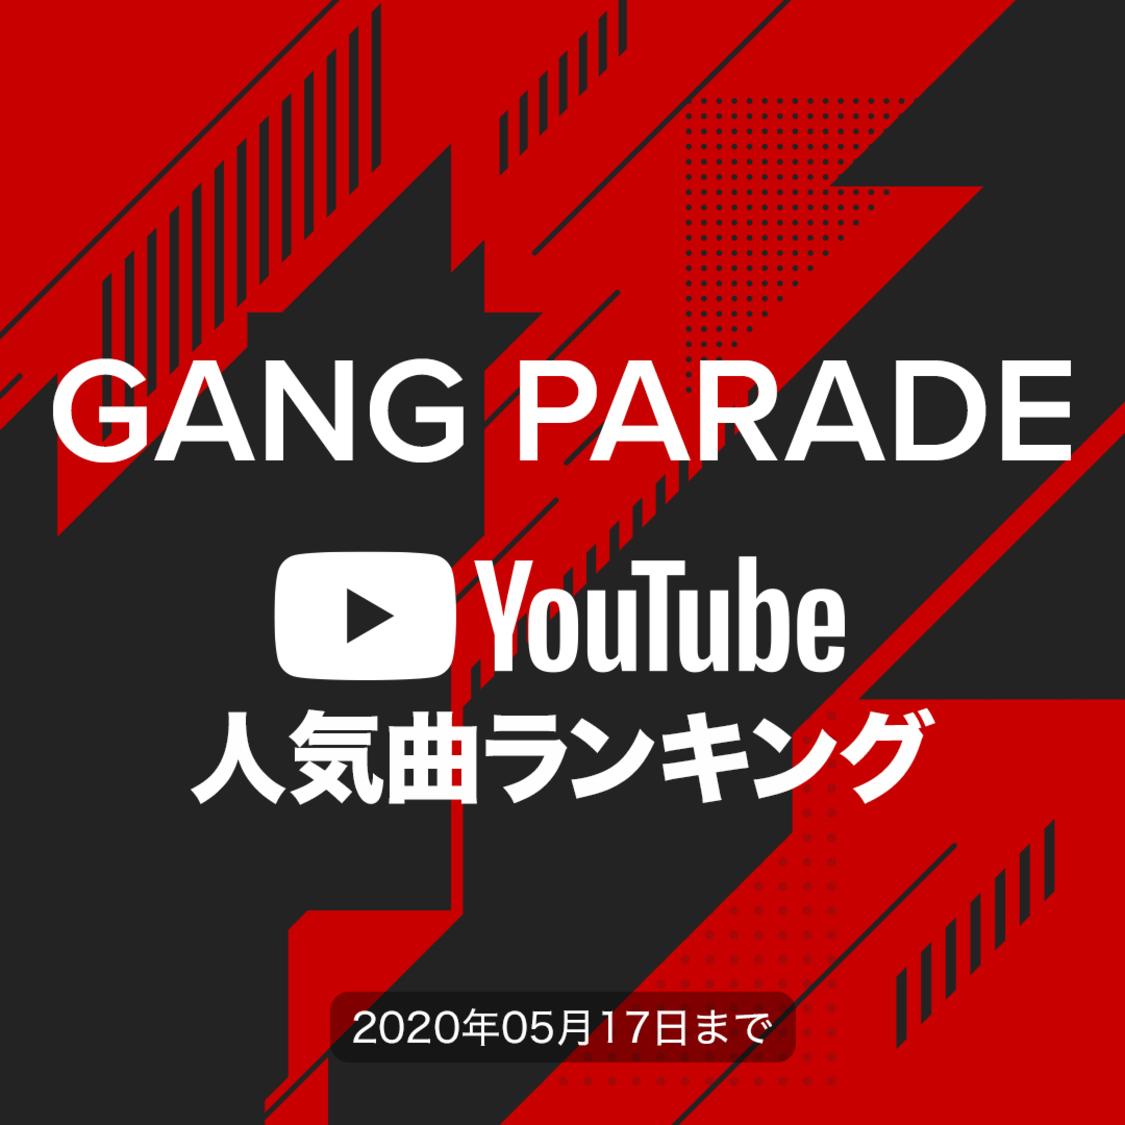 GANG PARADE[YouTube人気曲ランキング]再生回数が1番多い曲は?